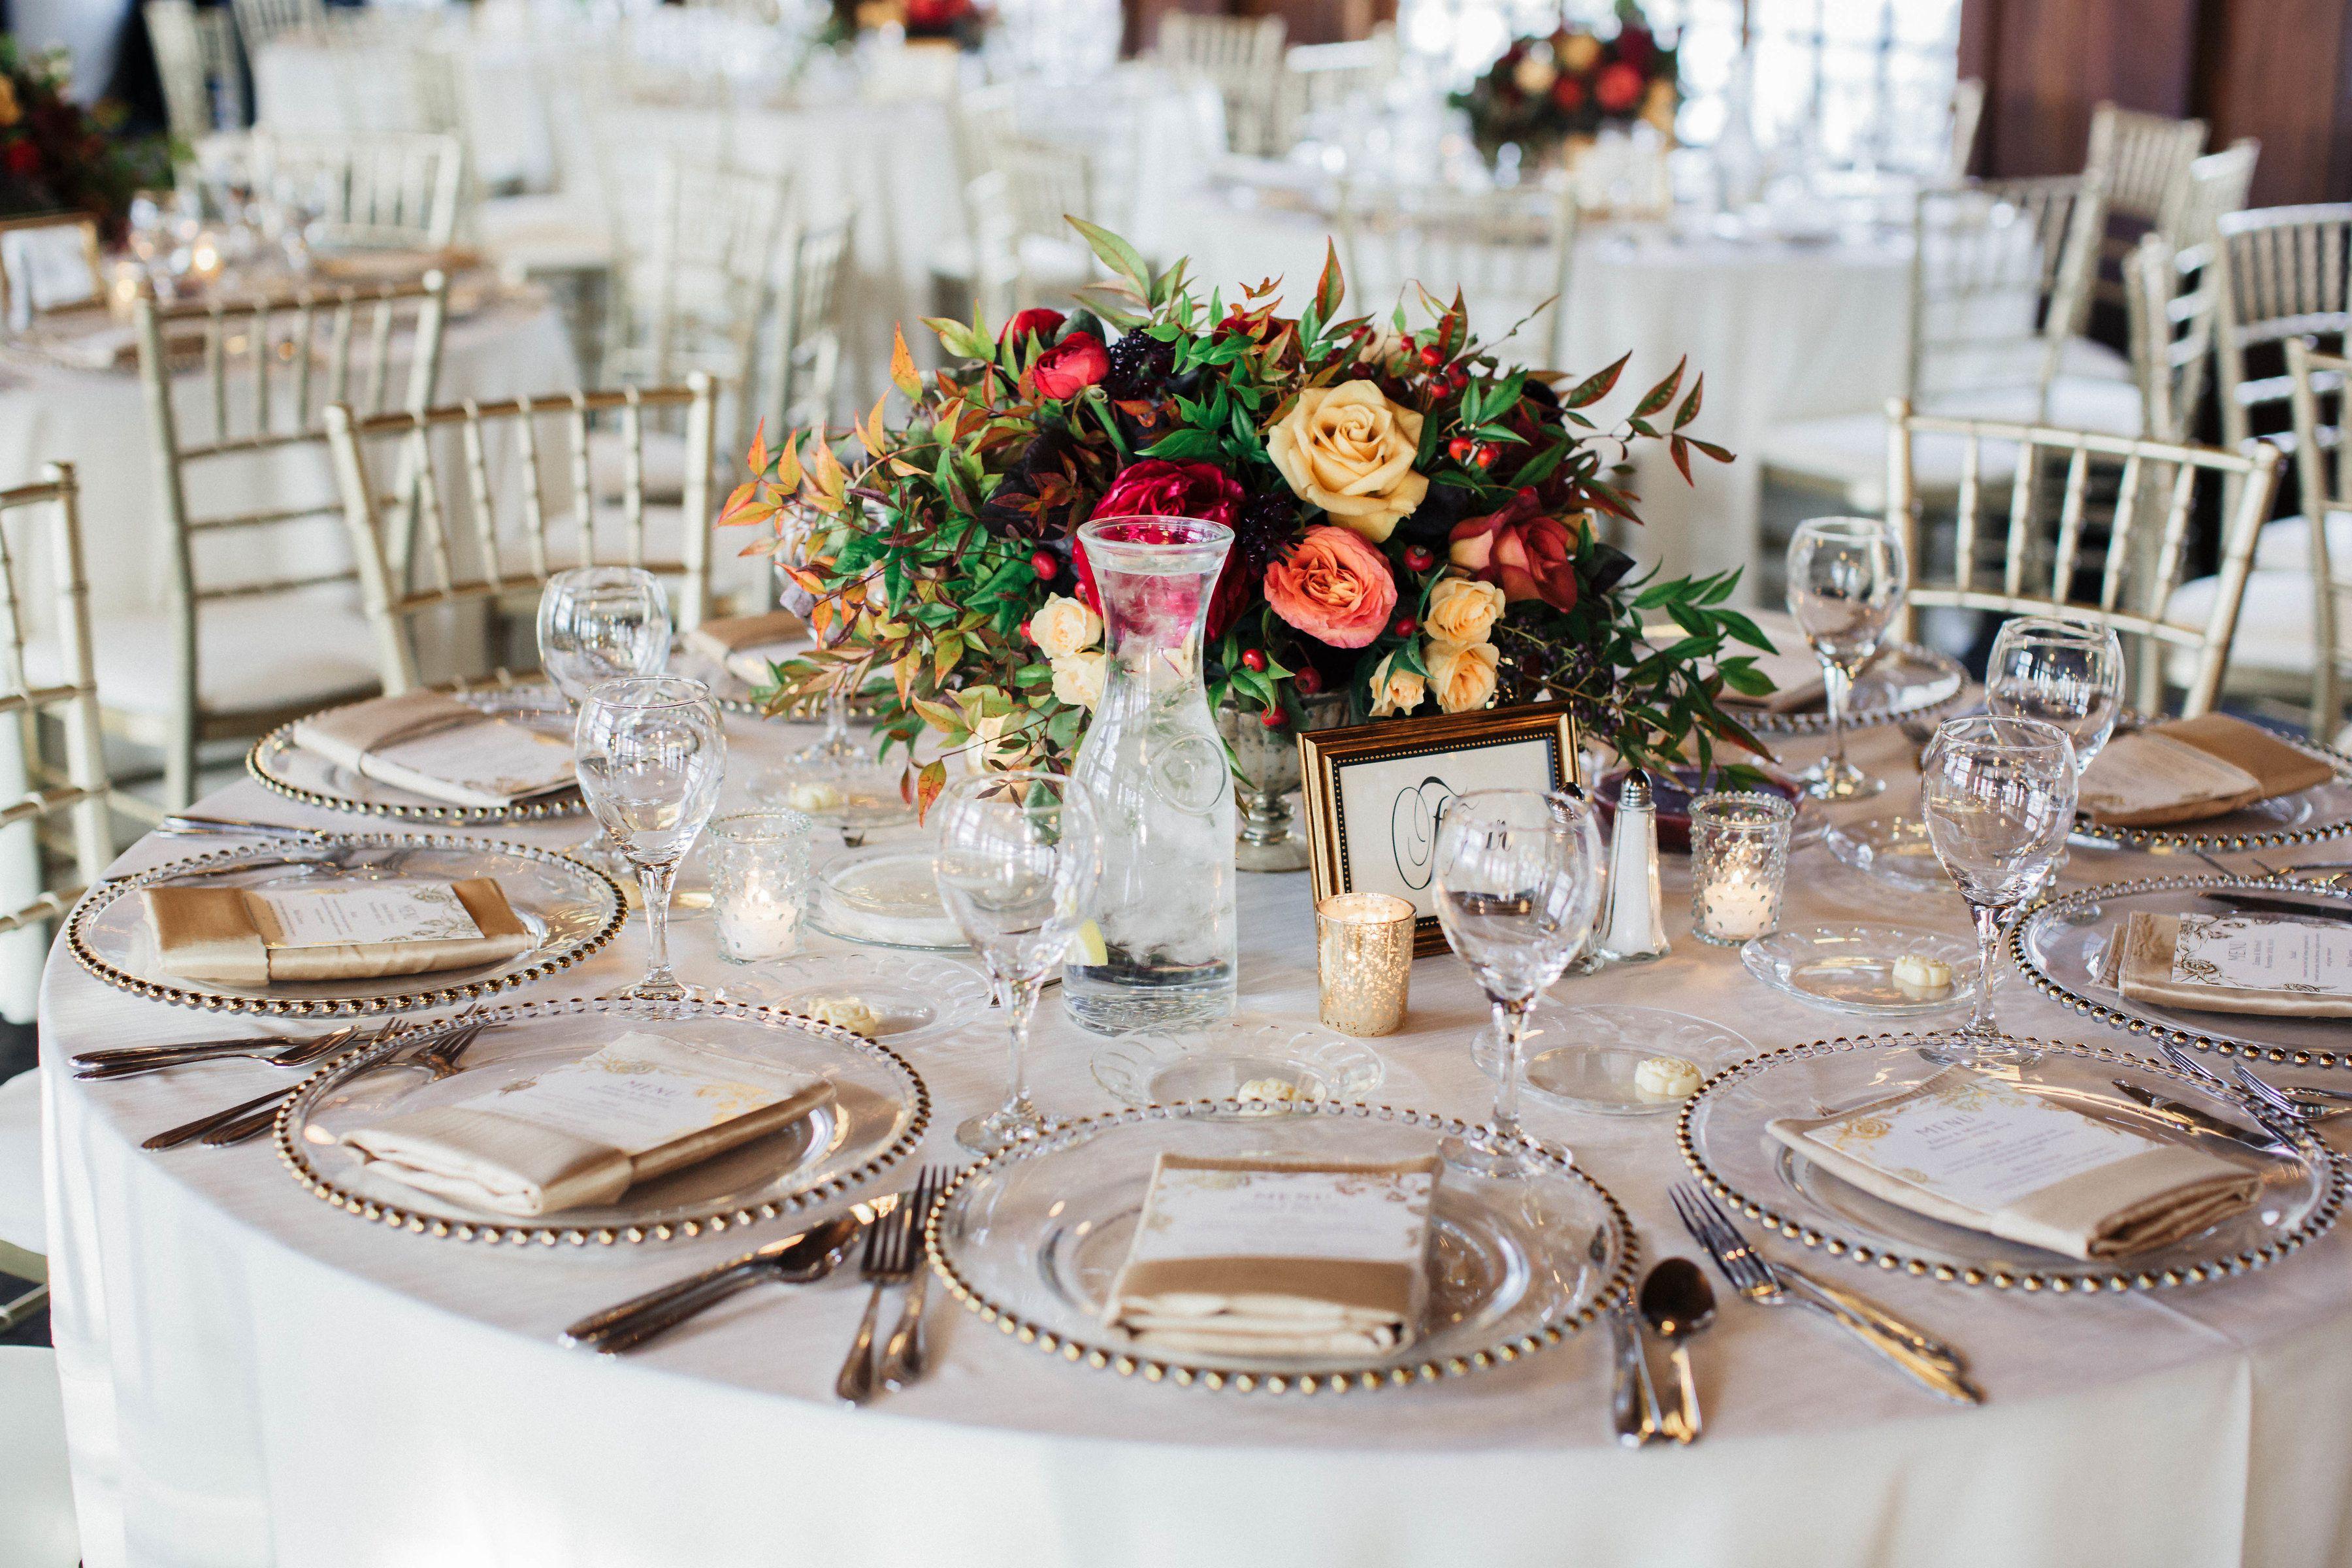 32 Dreamy Winter Wedding Photos Ideas For Winter Weddings